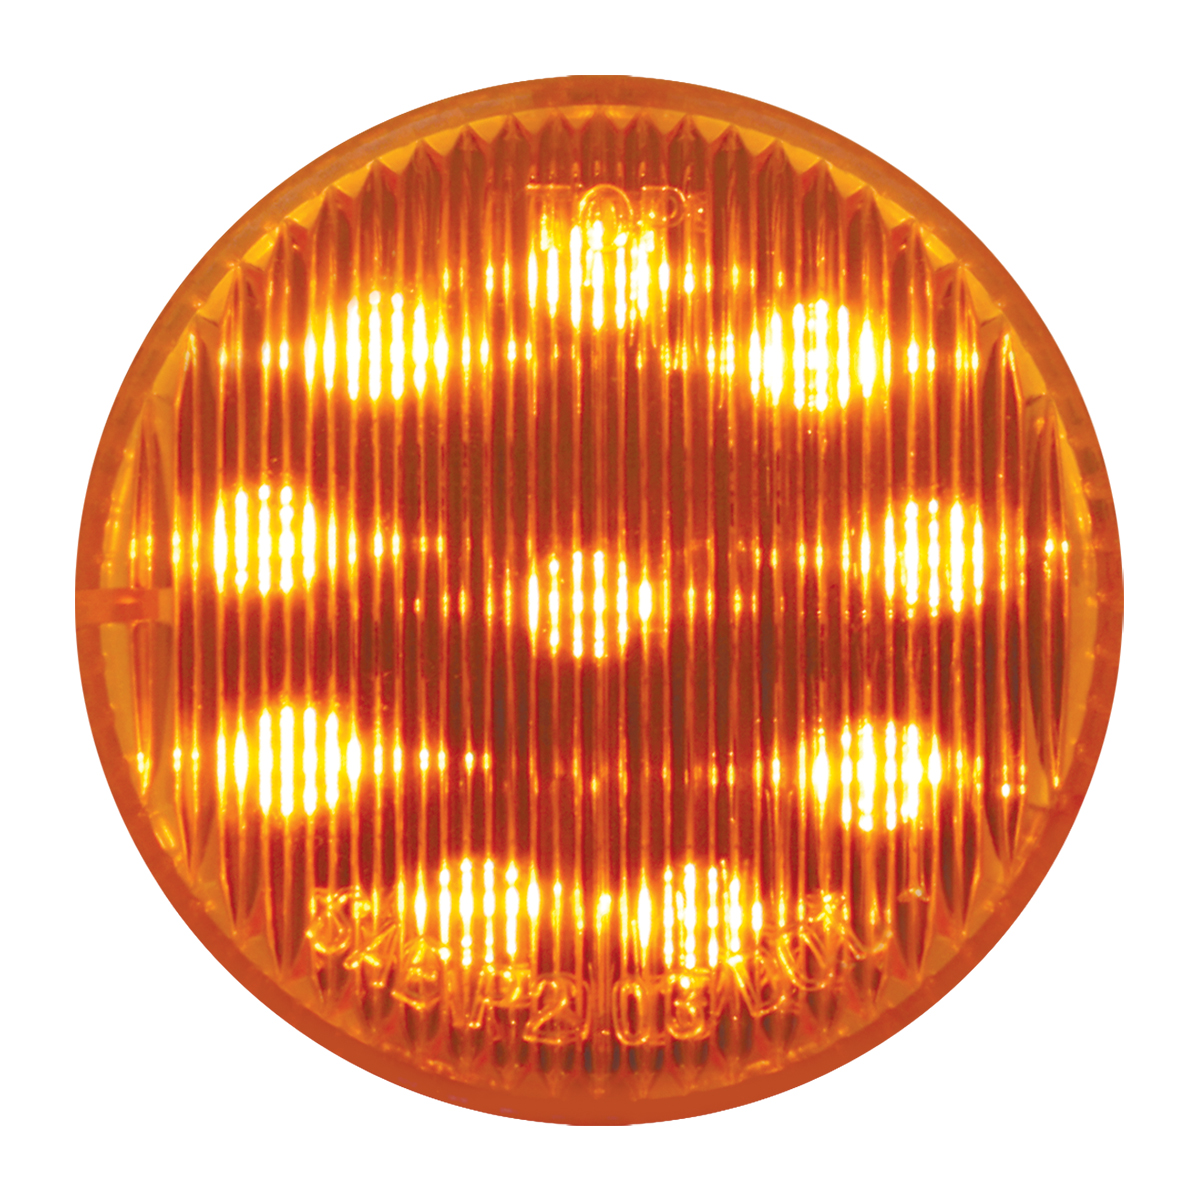 "#79280 2"" Round LED Flat Amber/Amber Light"